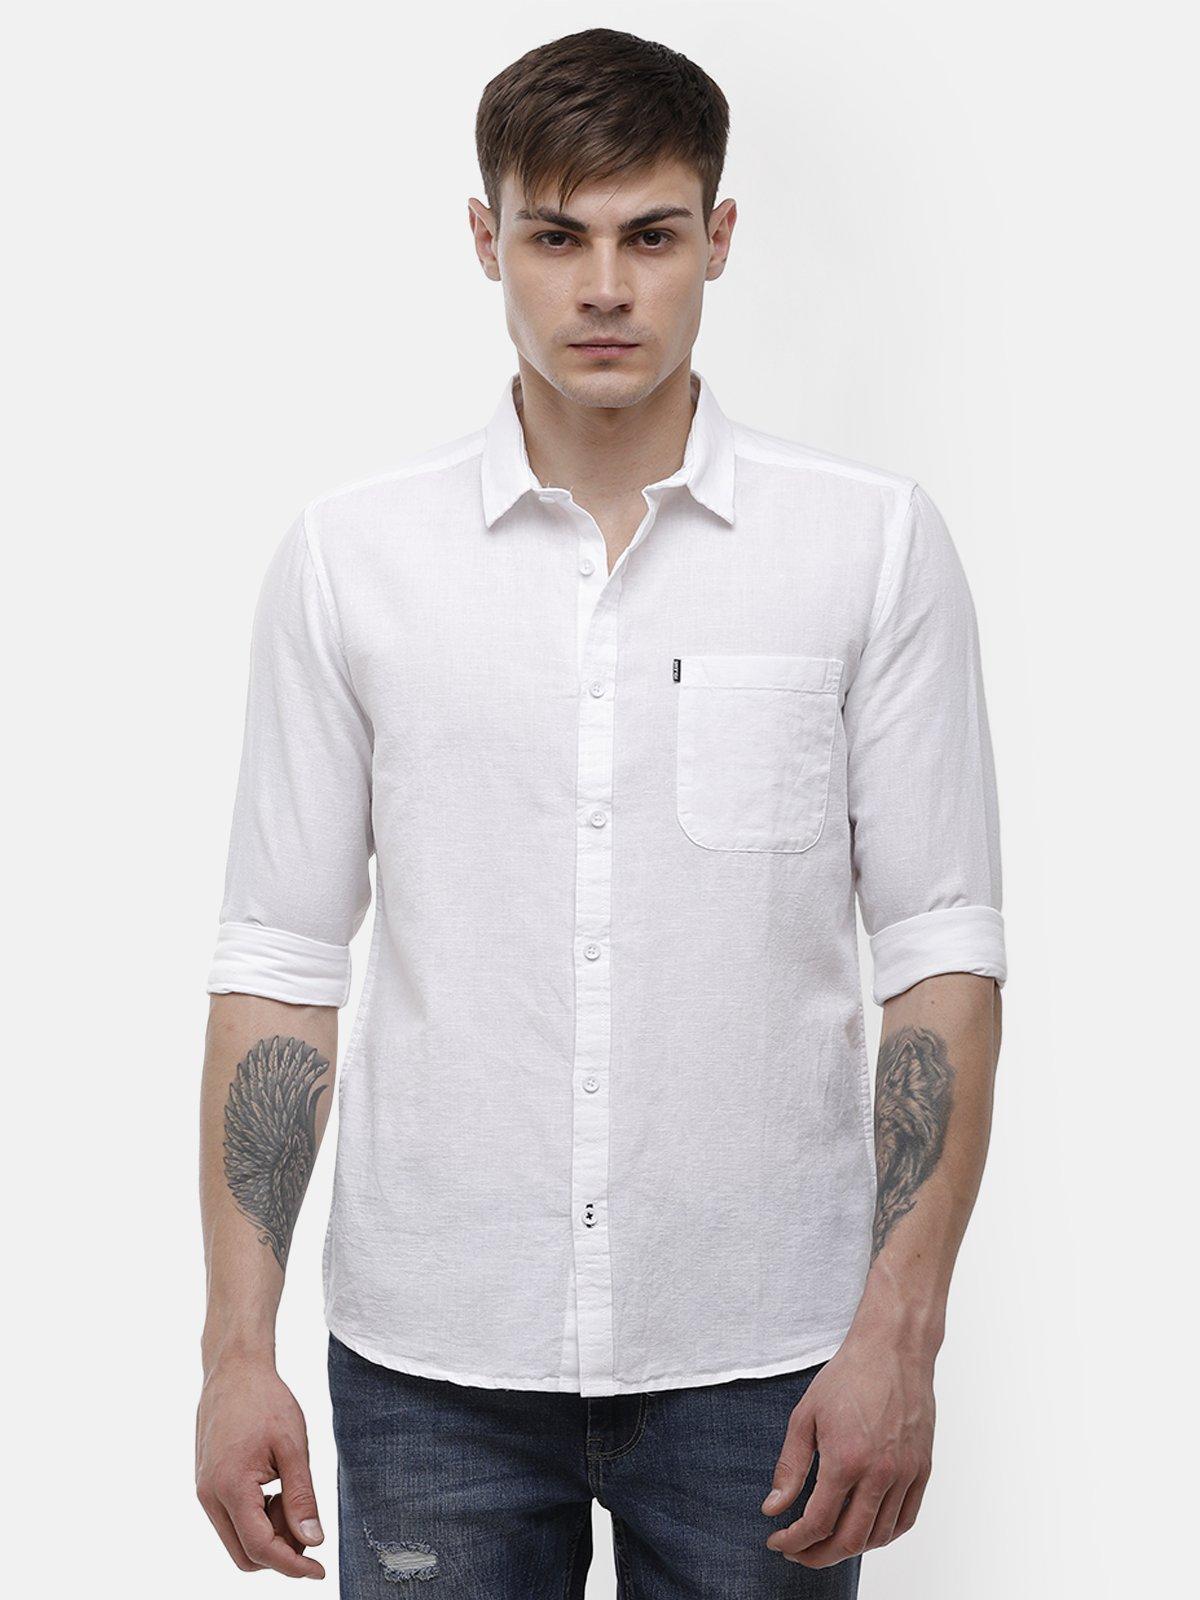 Voi Jeans   White Casual Shirt ( VOSH1349)